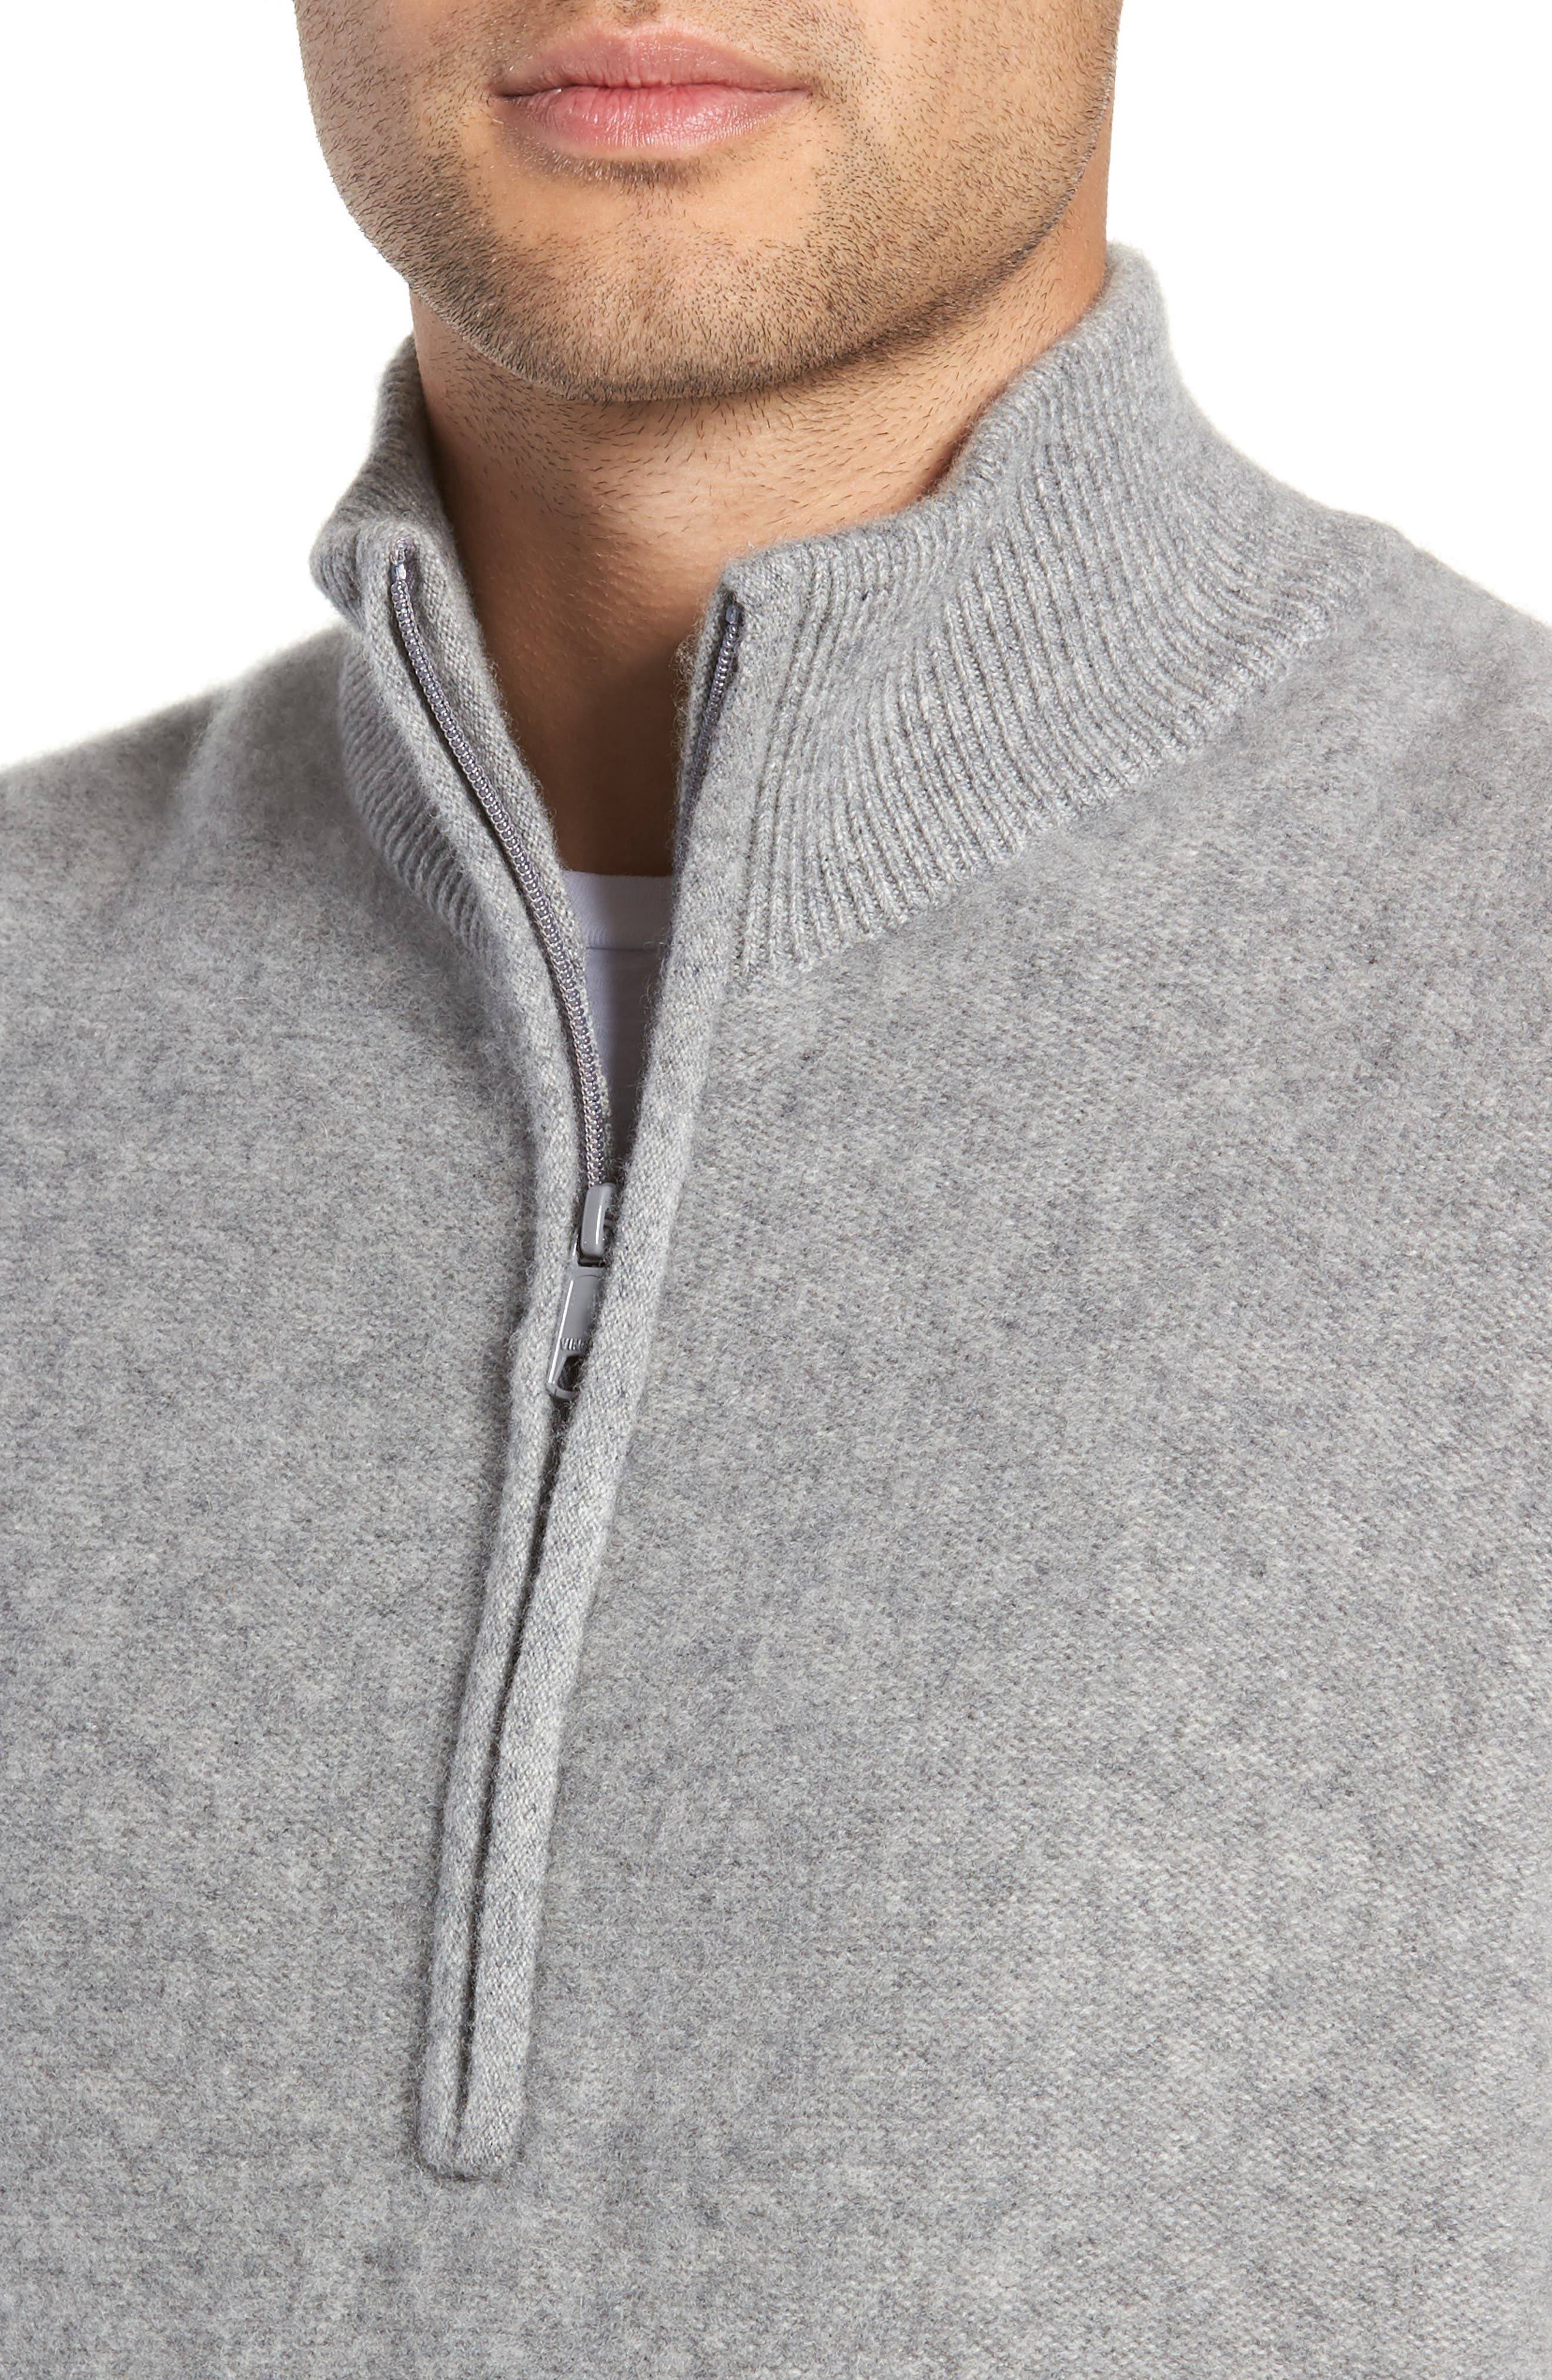 Cashmere Quarter Zip Sweater,                             Alternate thumbnail 4, color,                             H GREY